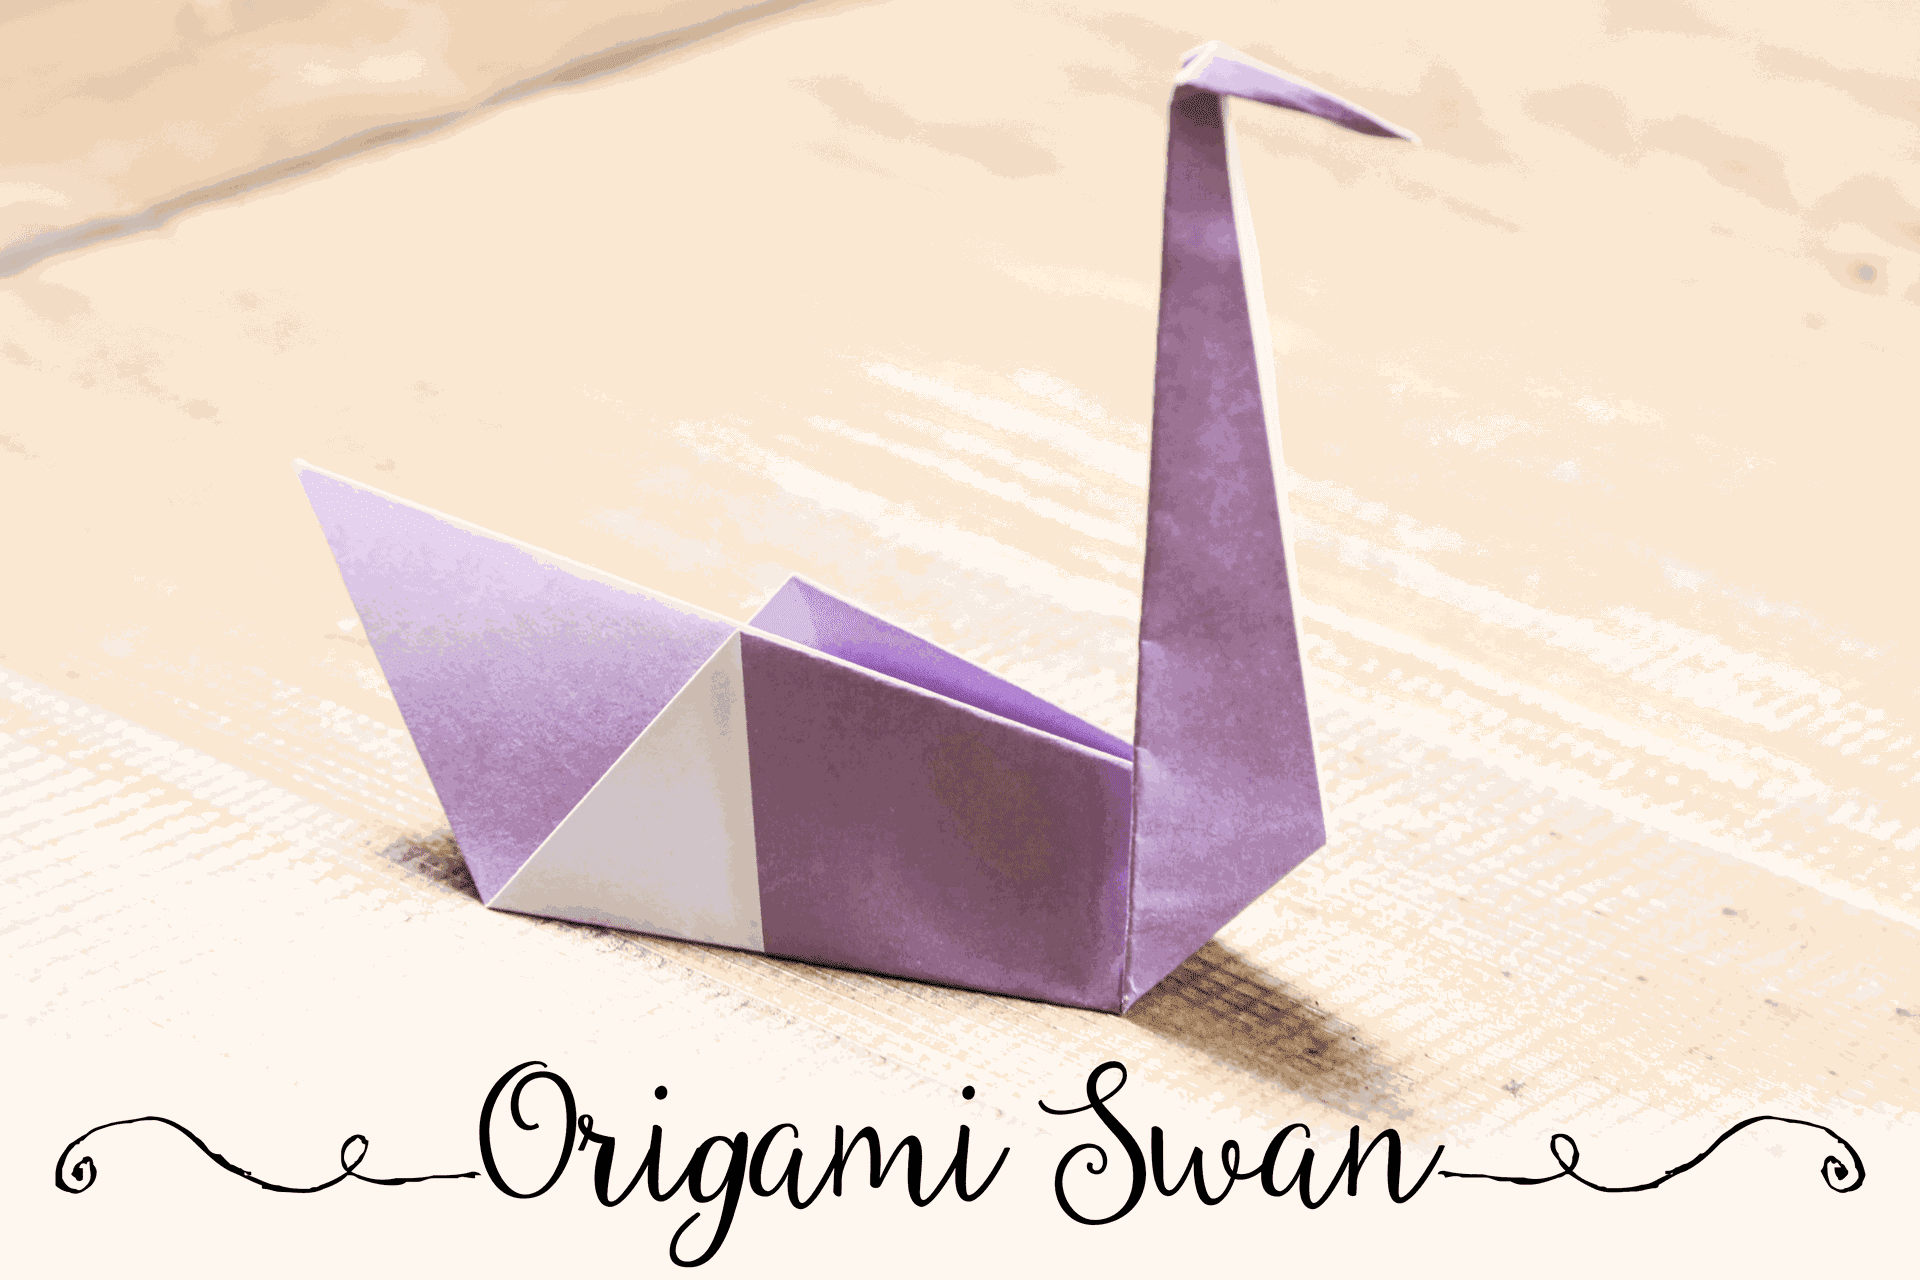 Origami Napkin Folding Swan - YouTube | 1280x1920